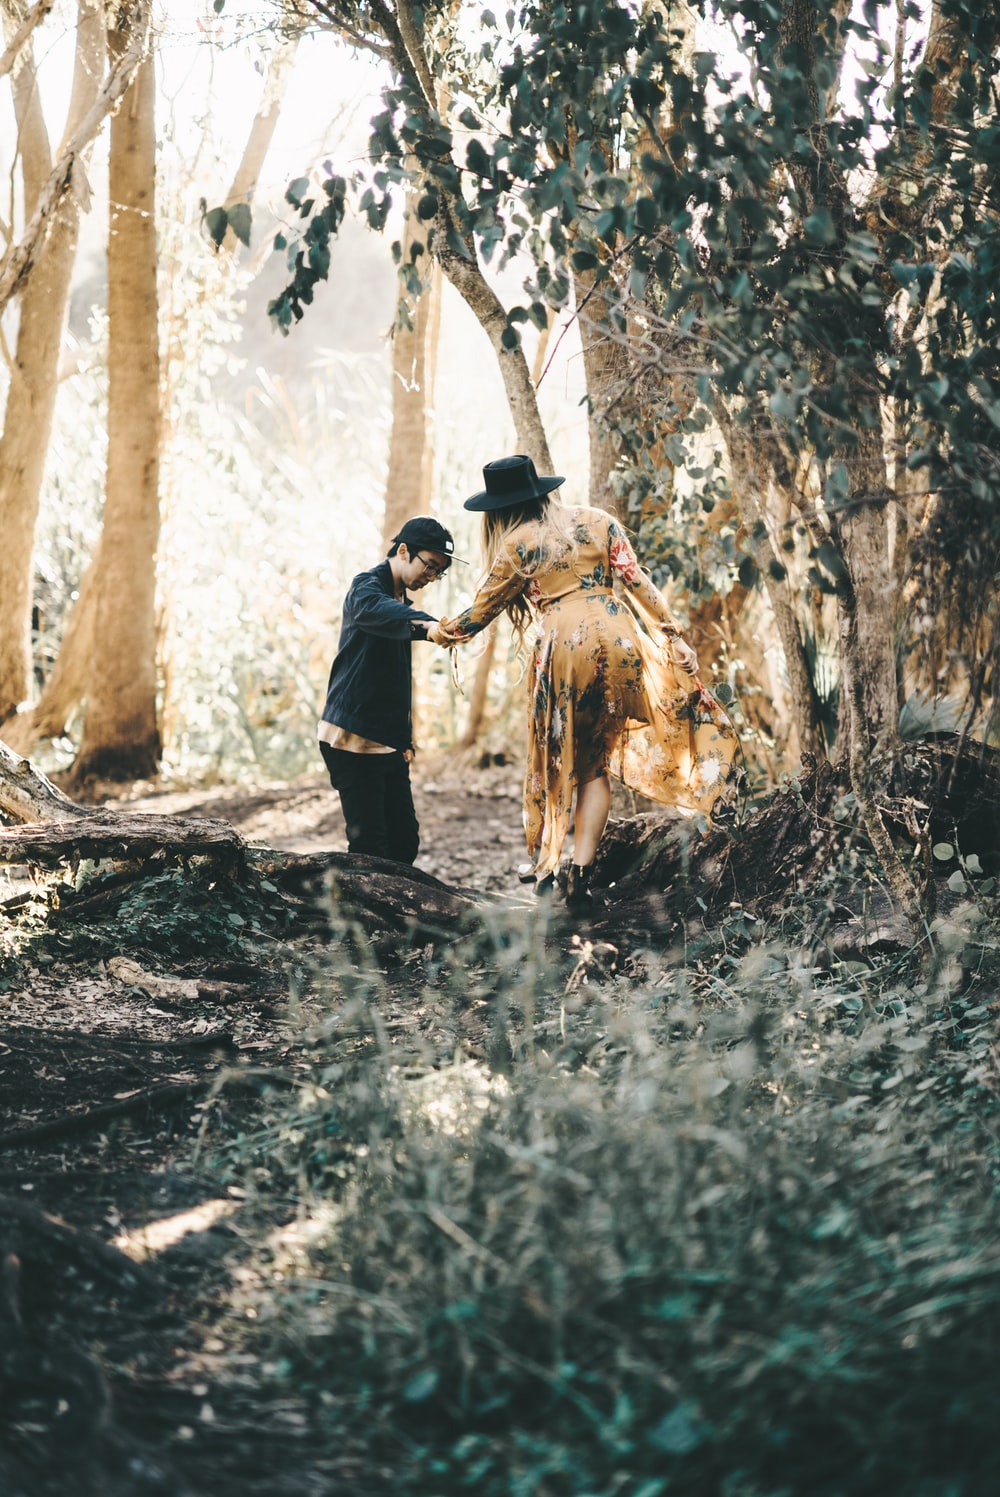 man helping woman cross tree trunk